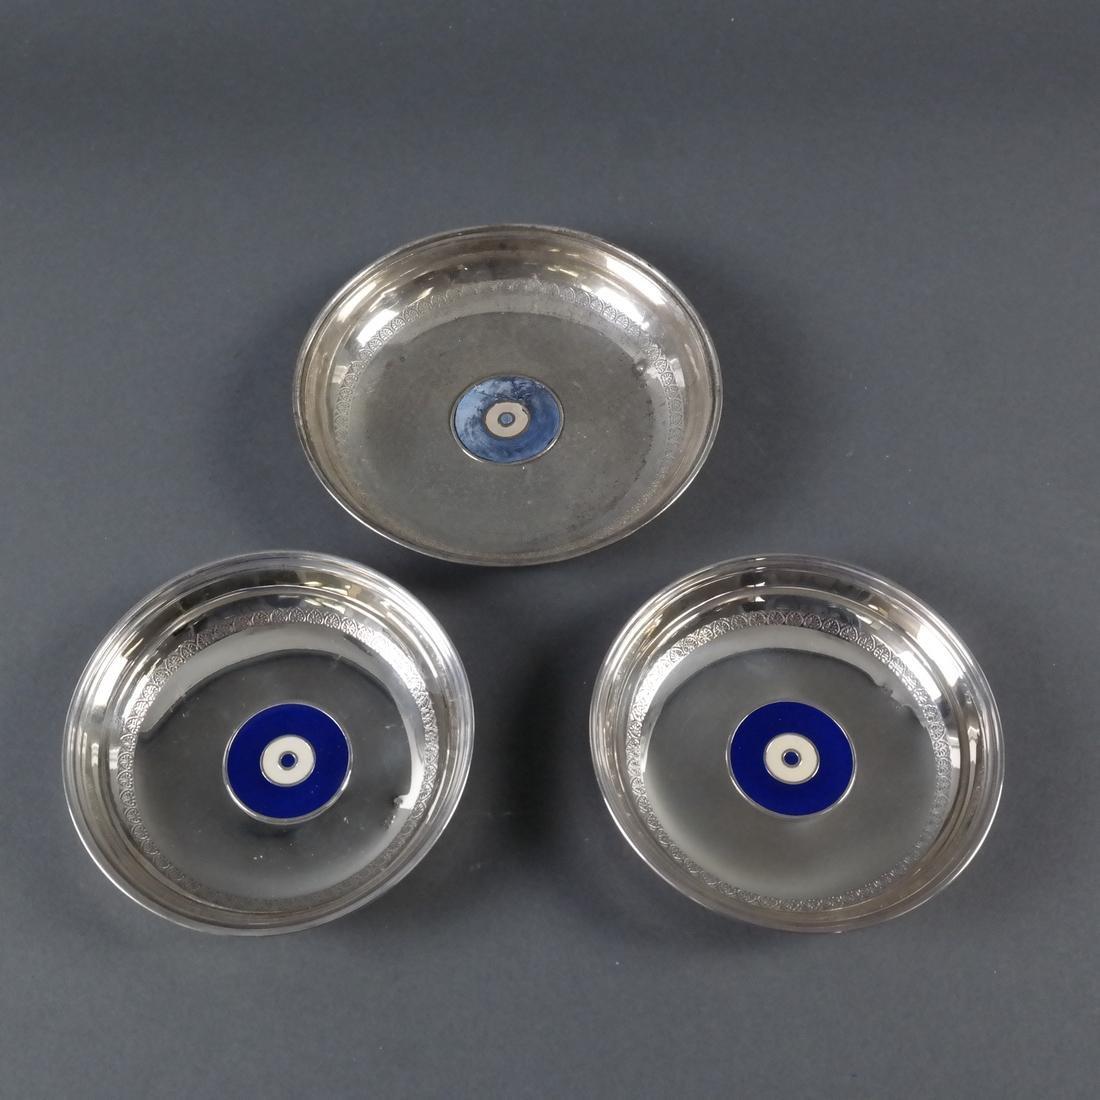 Three .900 Standard Silver Bowls